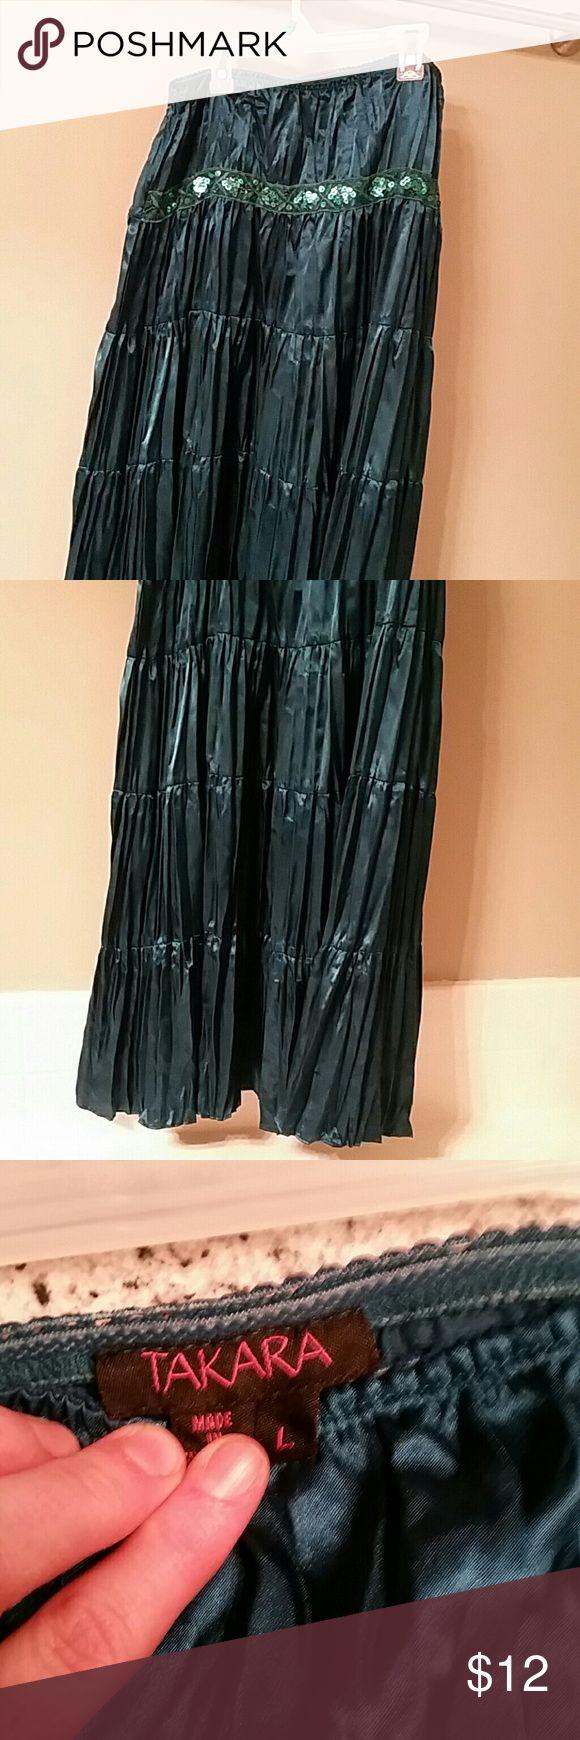 maxi skirt dark teal maxi skirt size large Takara Skirts Maxi